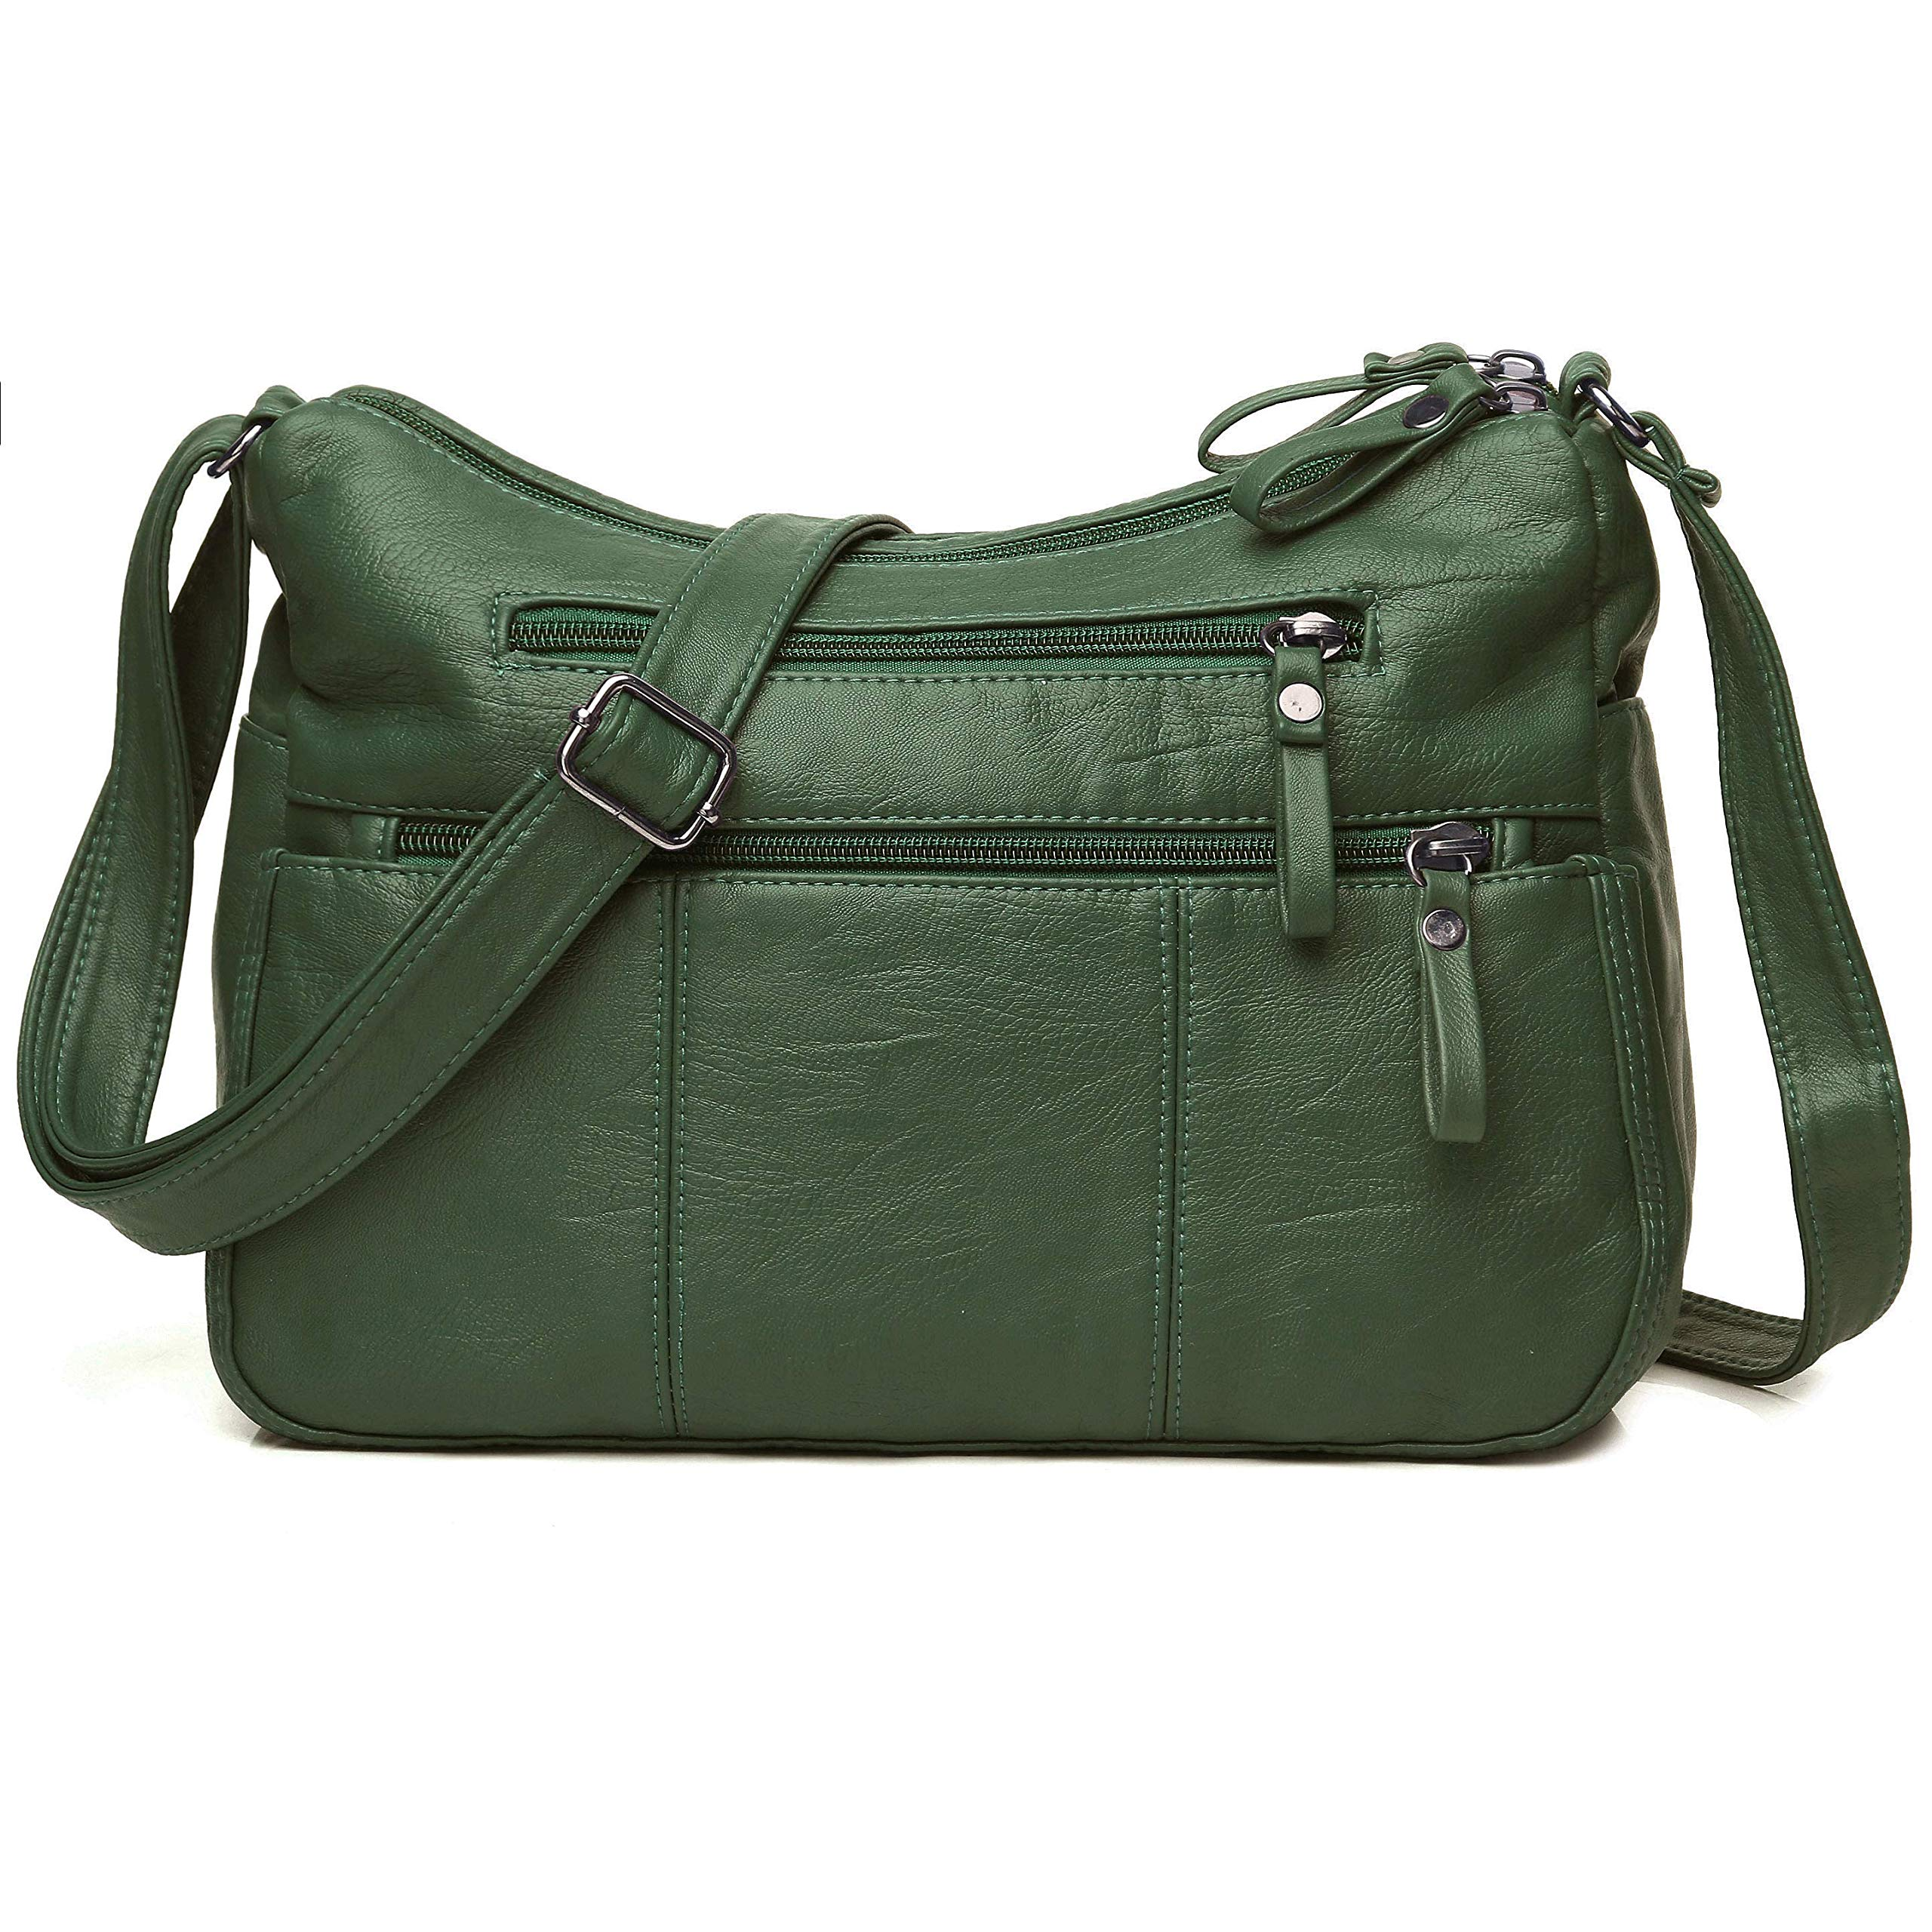 crossbody handbags on clearance amazon com rh amazon com